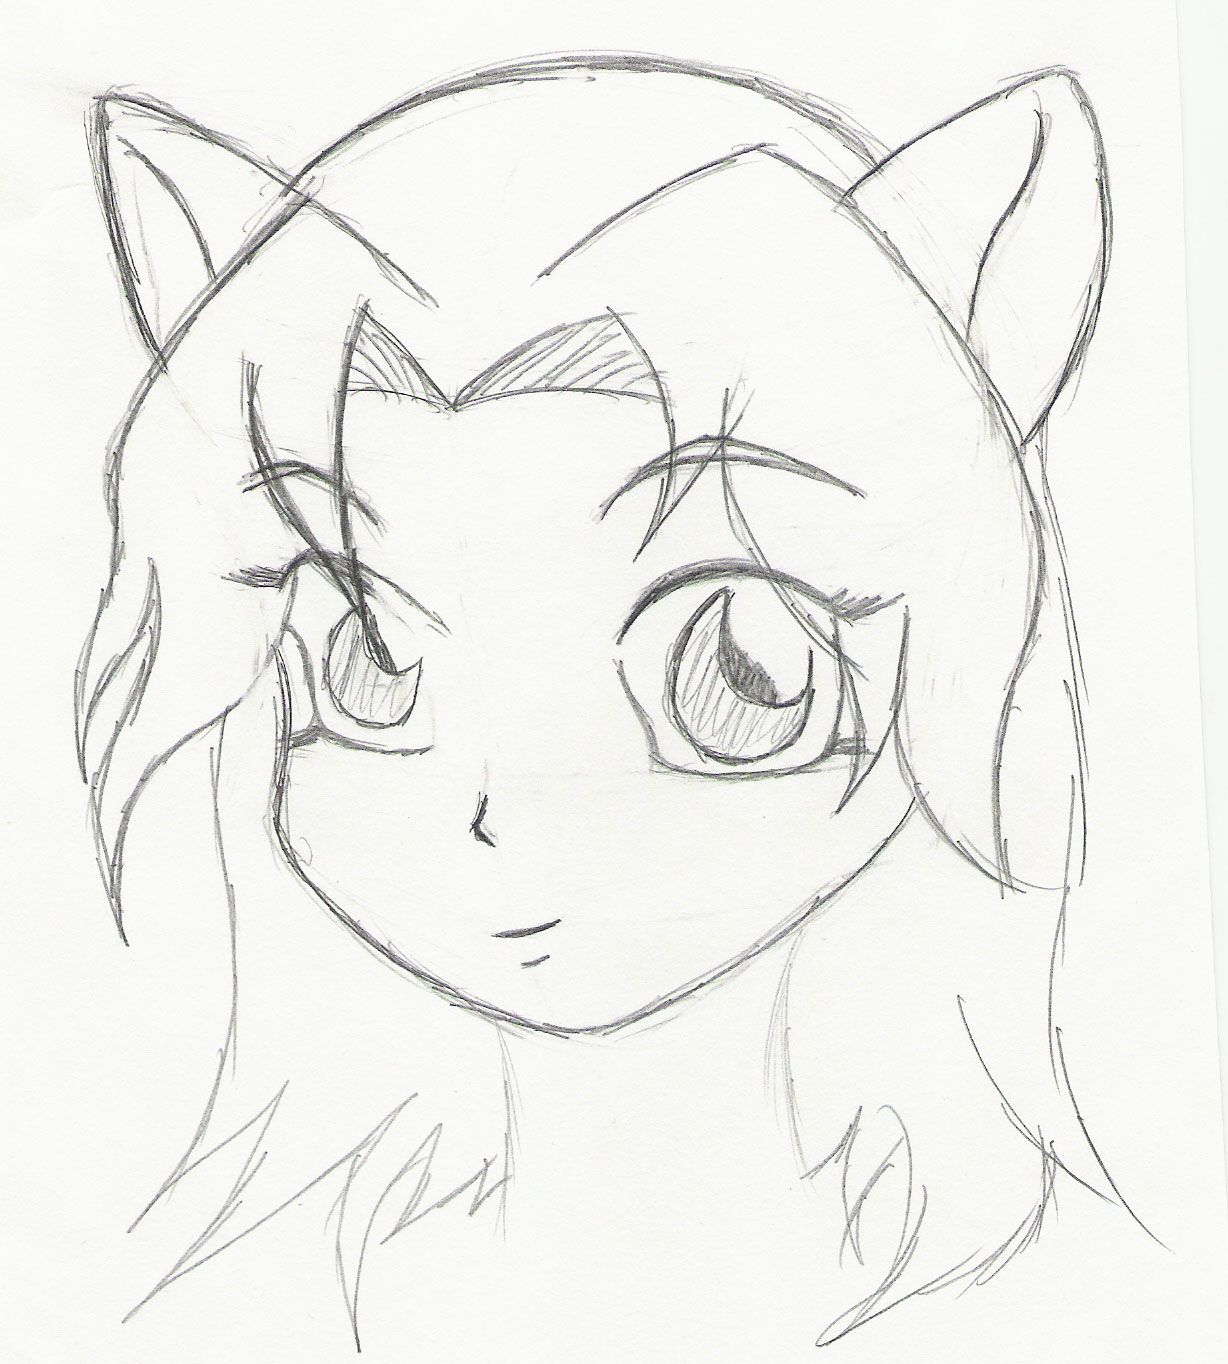 Anime Girl And Boy Drawing Easy Anime Sketch Of A Girl And Boy Boy